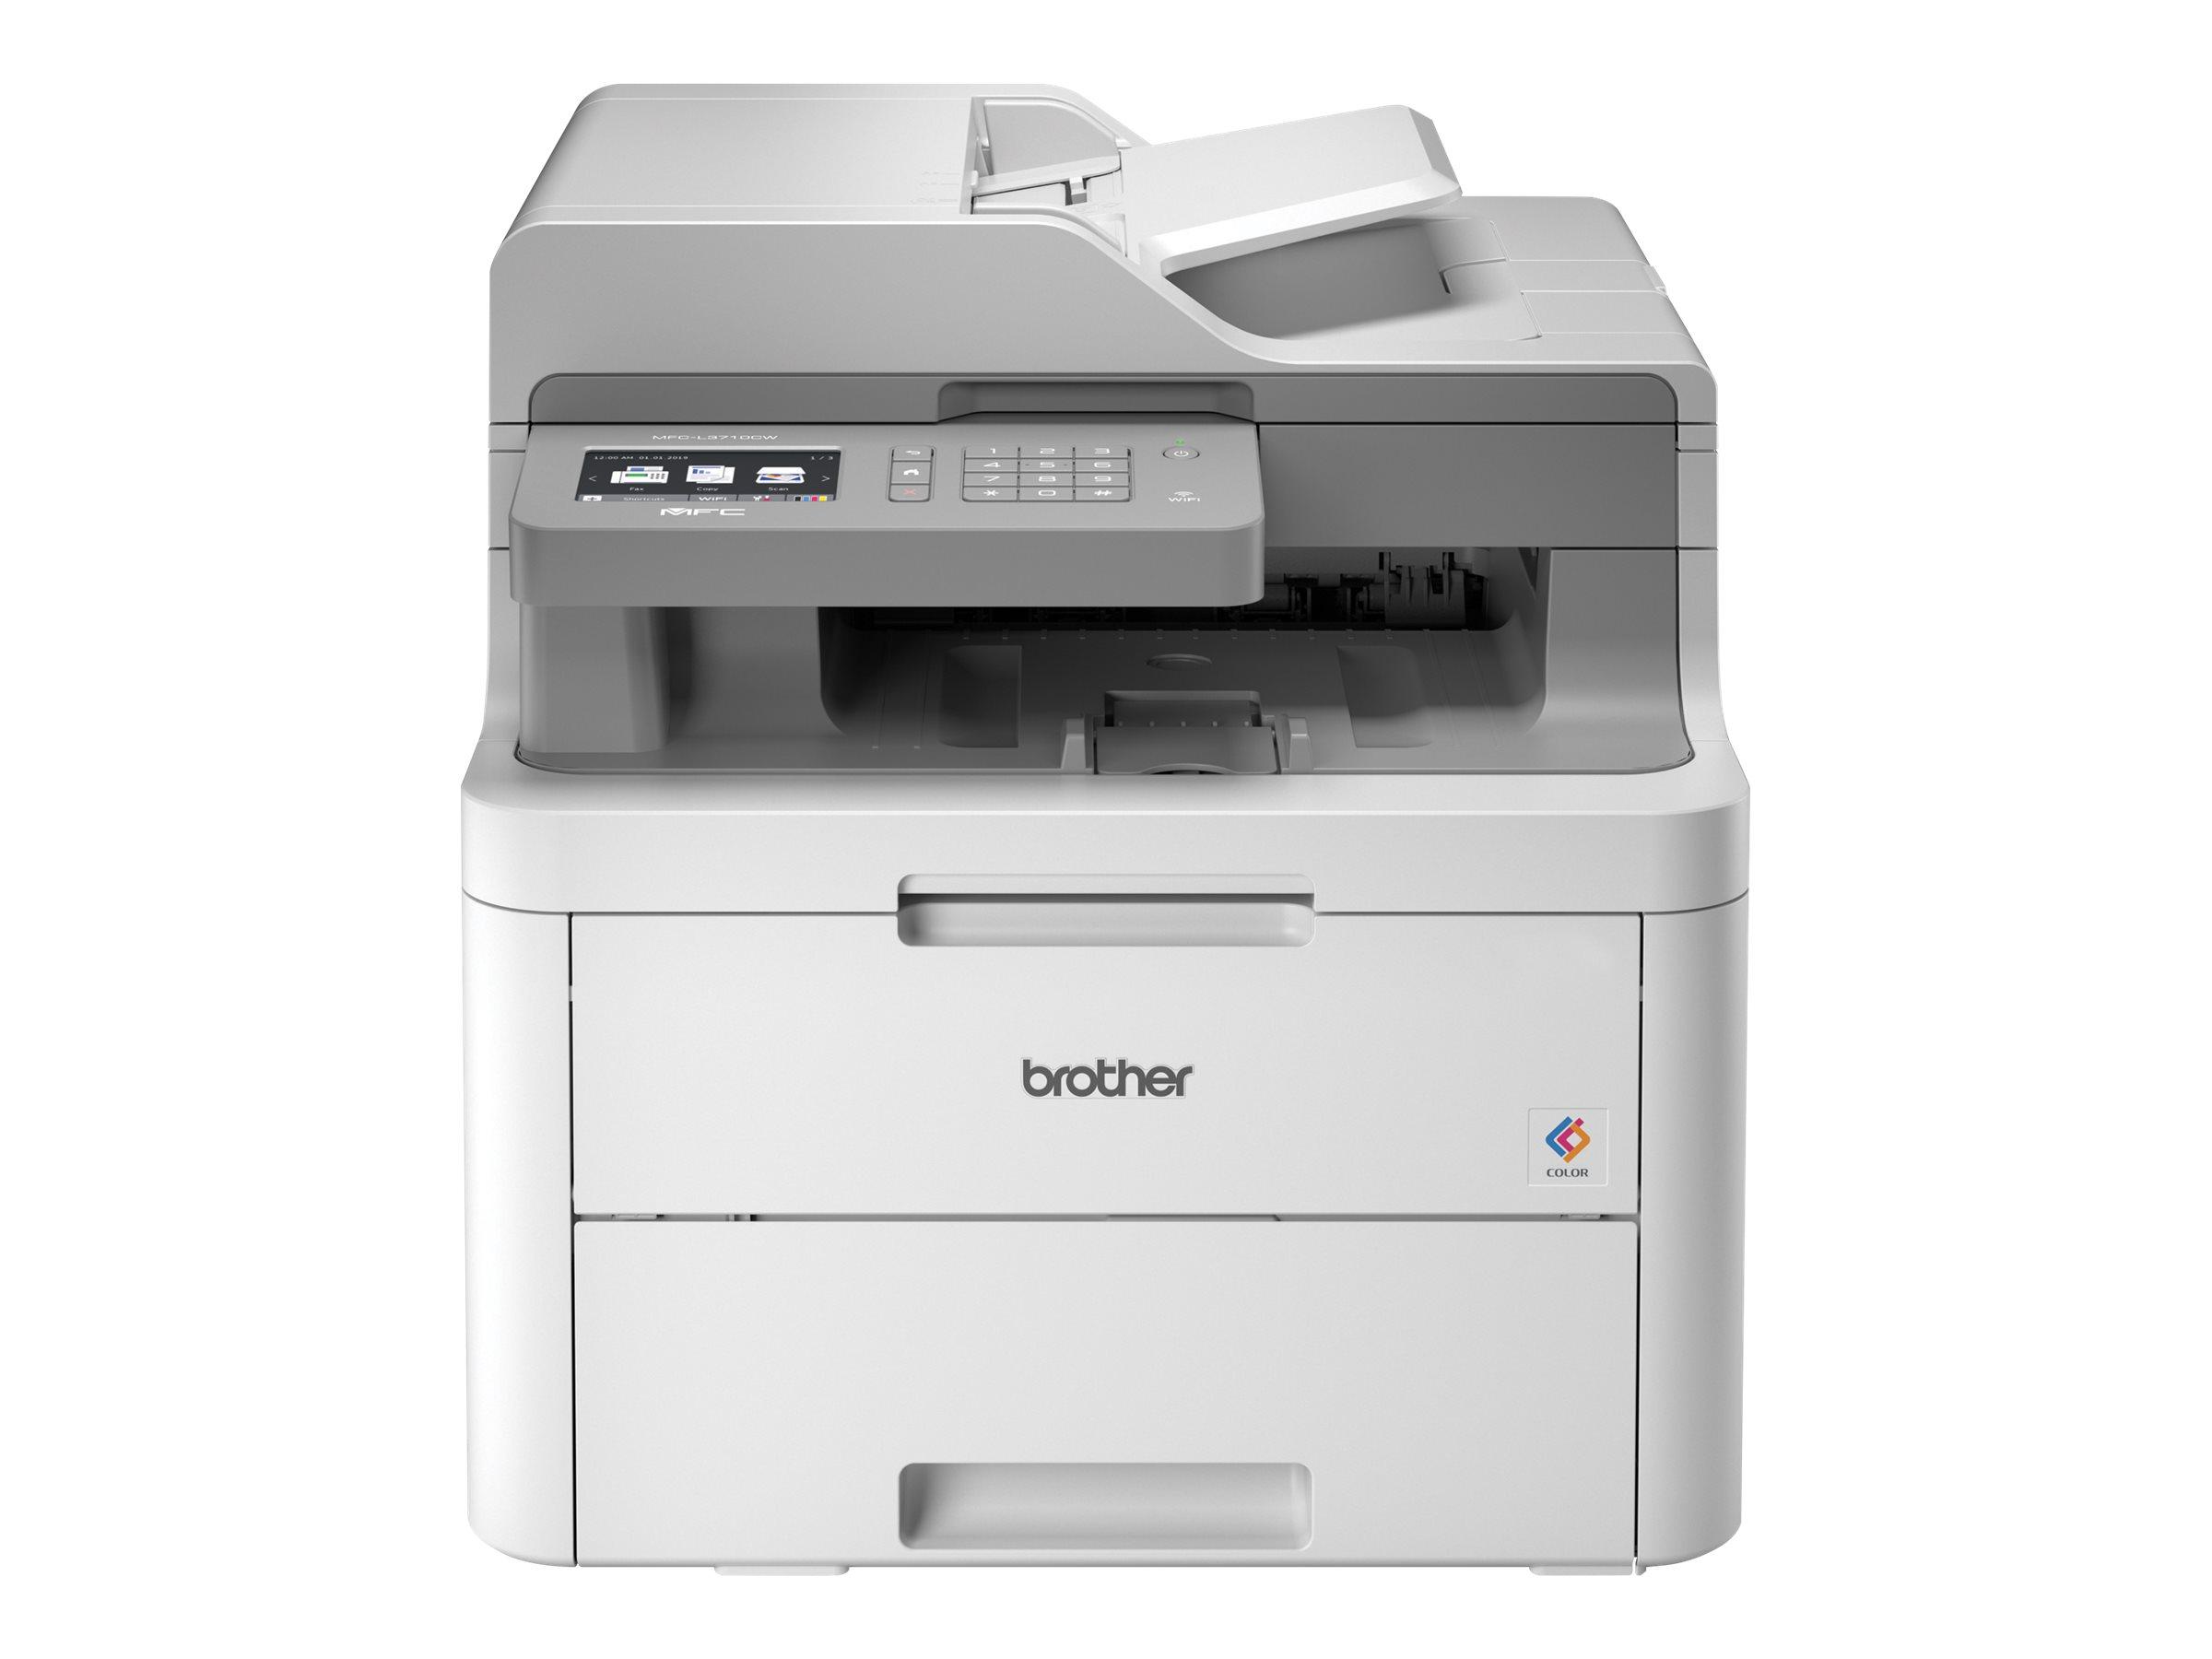 Brother MFC-L3710CW - Multifunktionsdrucker - Farbe - LED - Legal (216 x 356 mm)